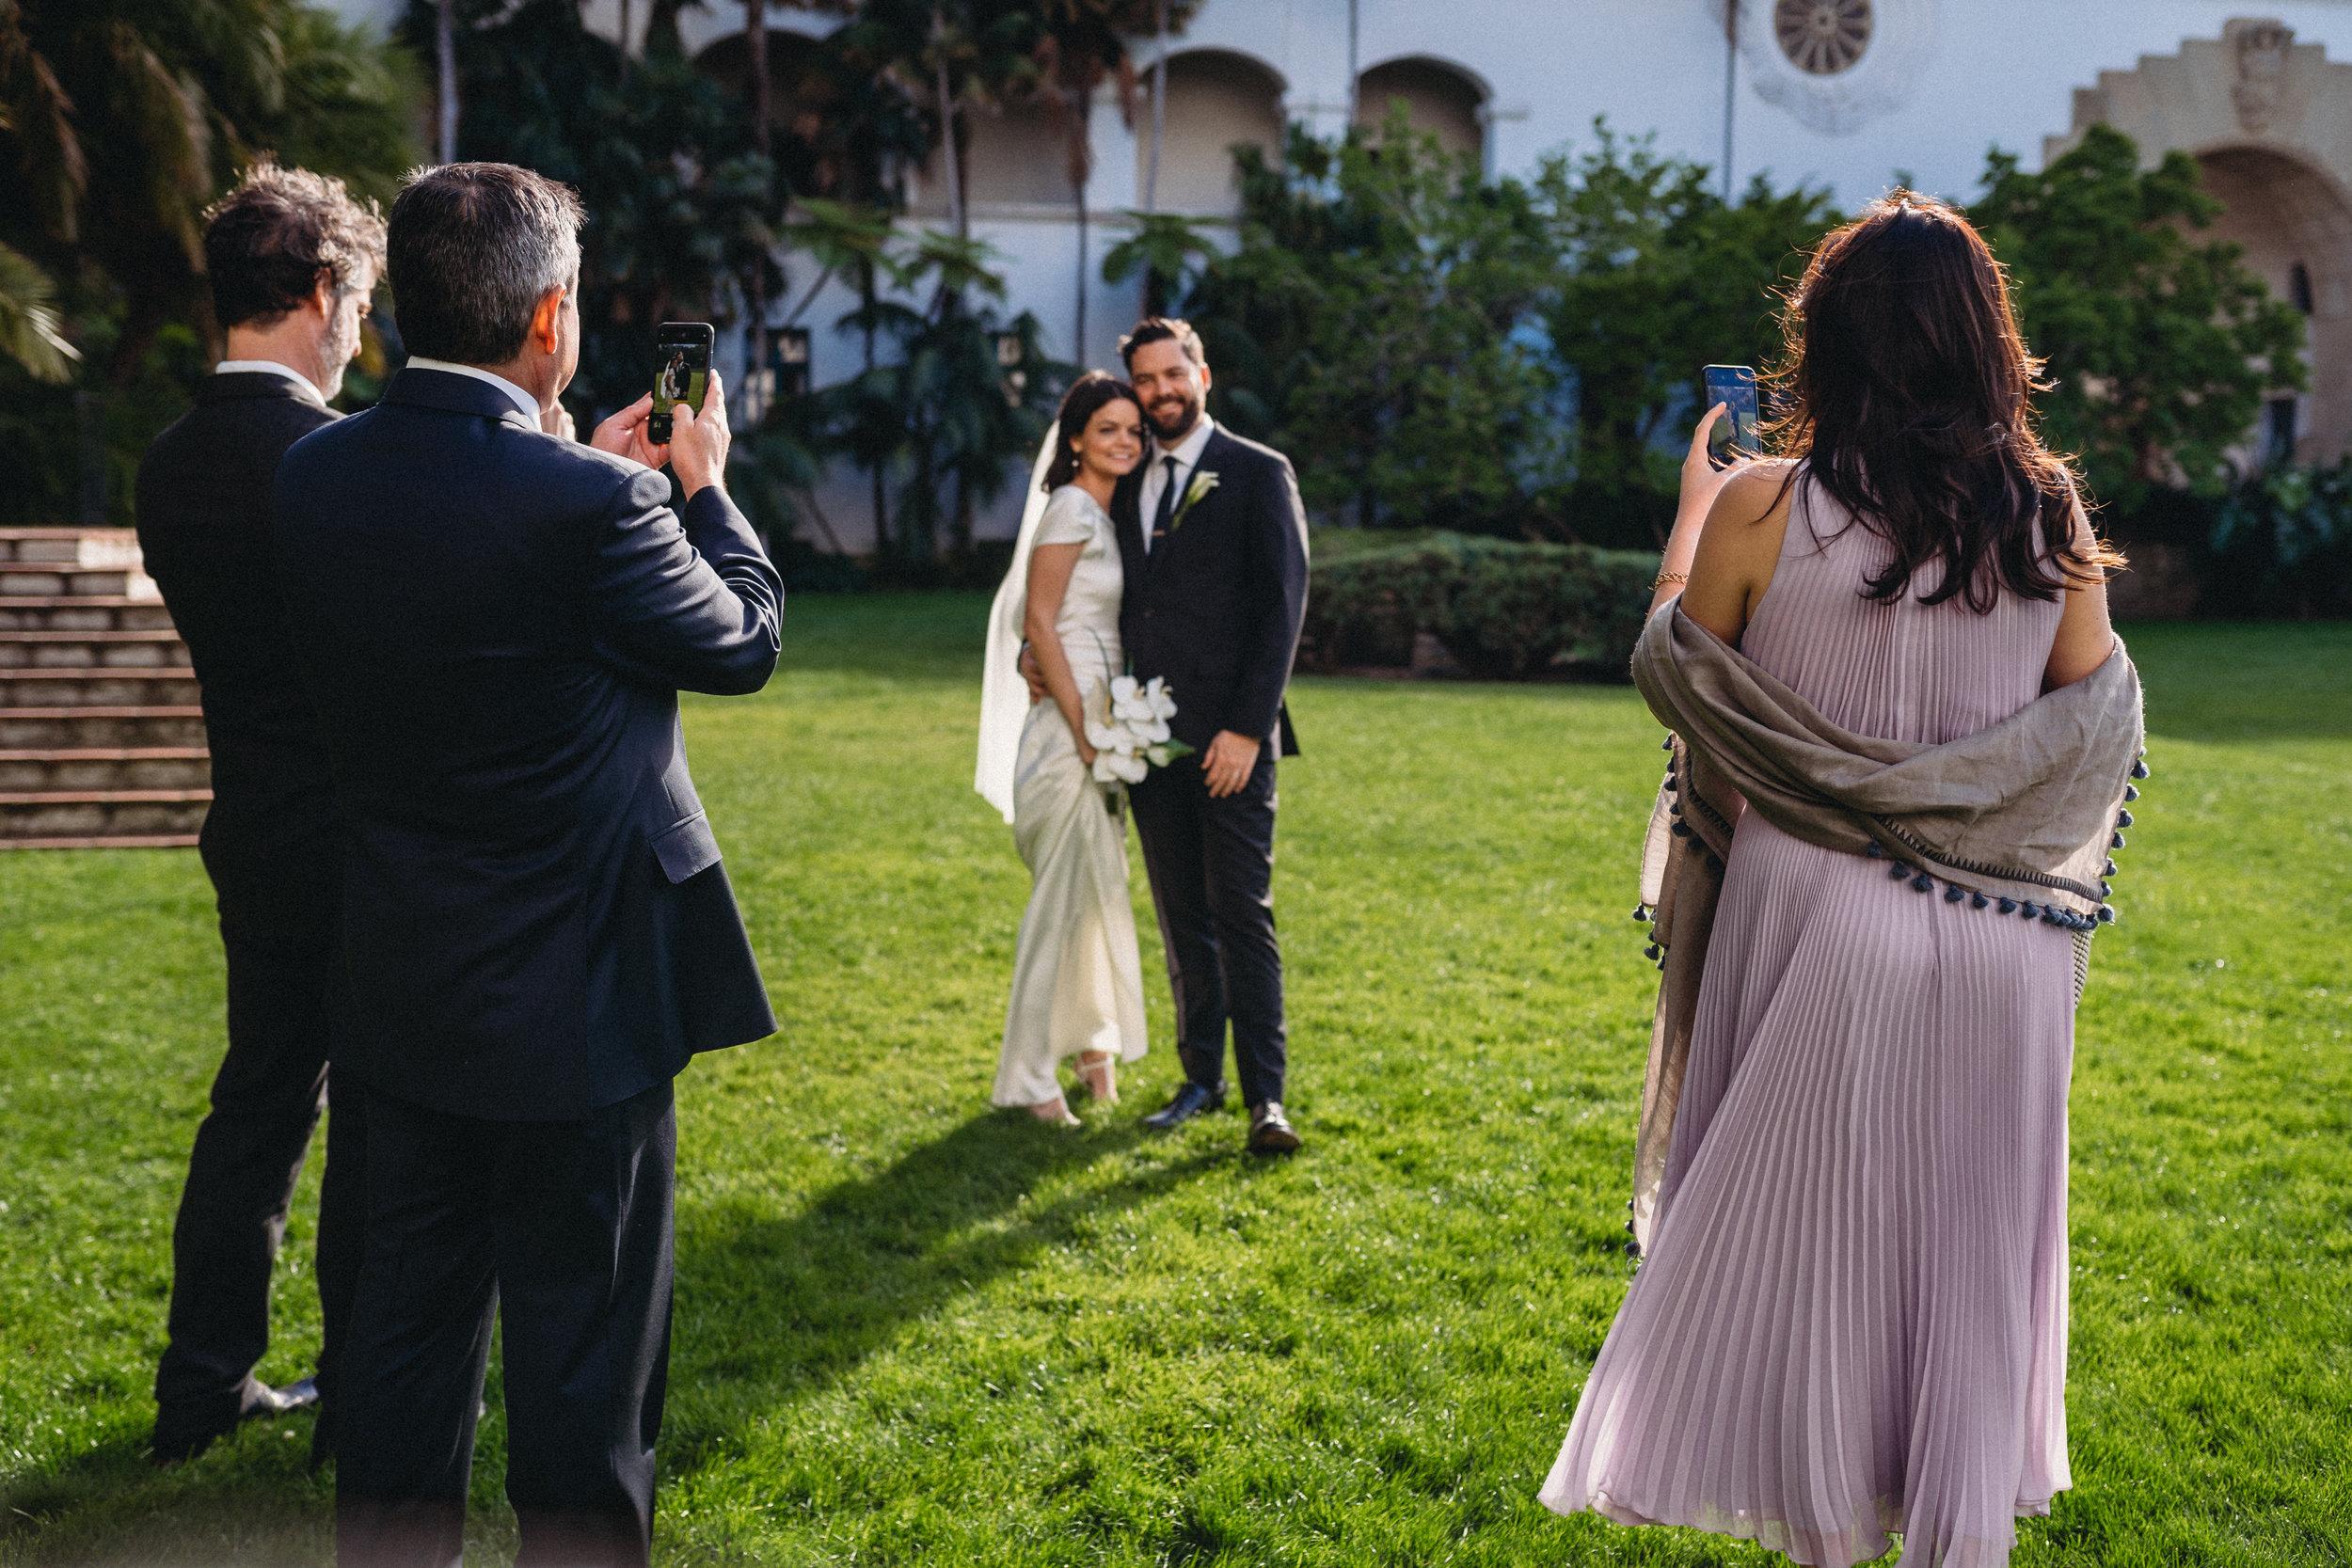 wedding-photography-santa-barbara-courthouse-rebeccaylasotras-124.jpg